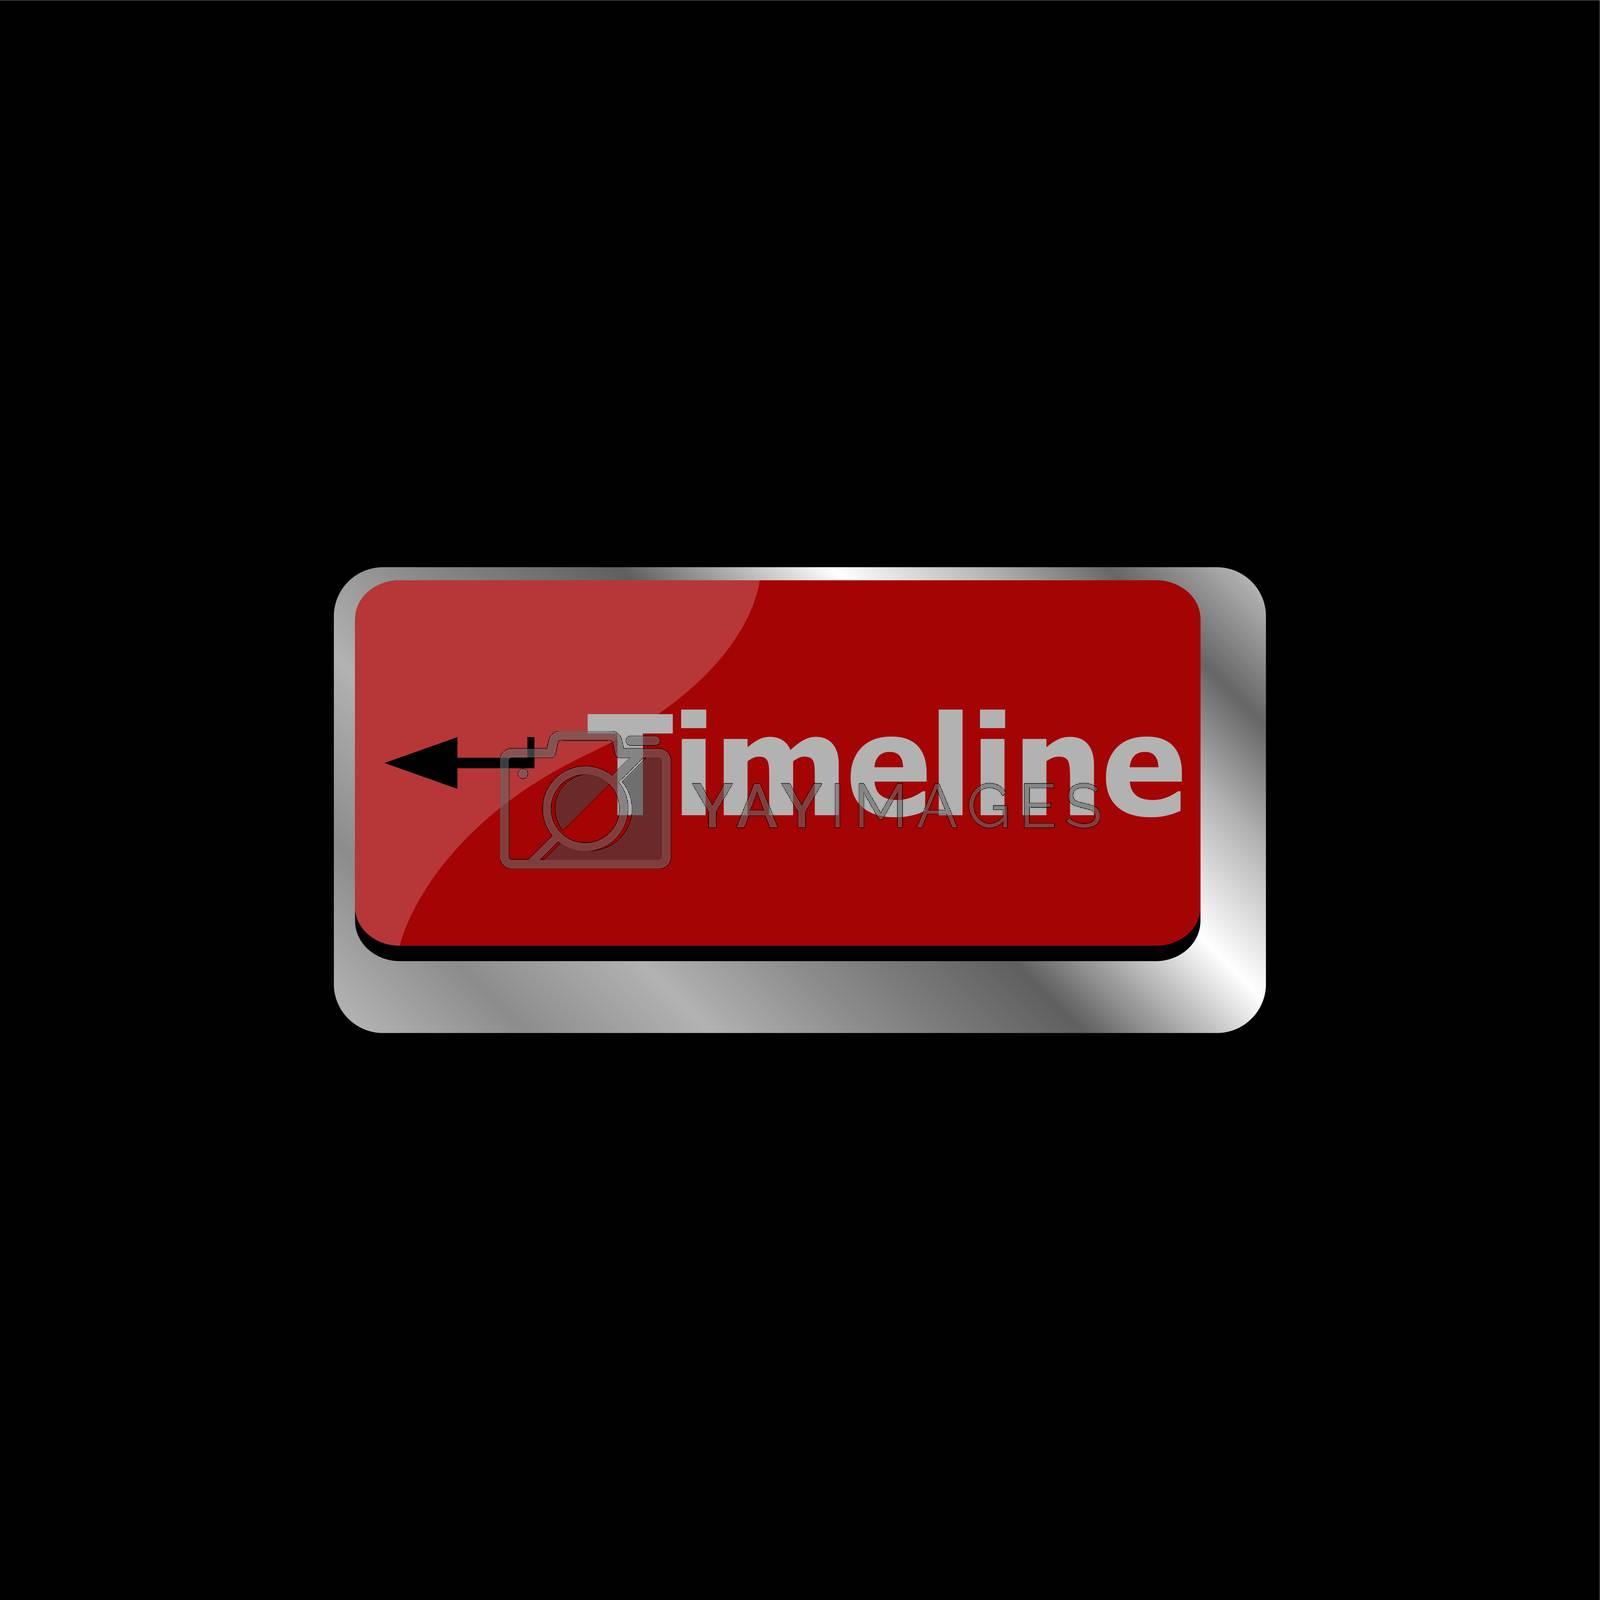 timeline concept button on computer keyboard keys